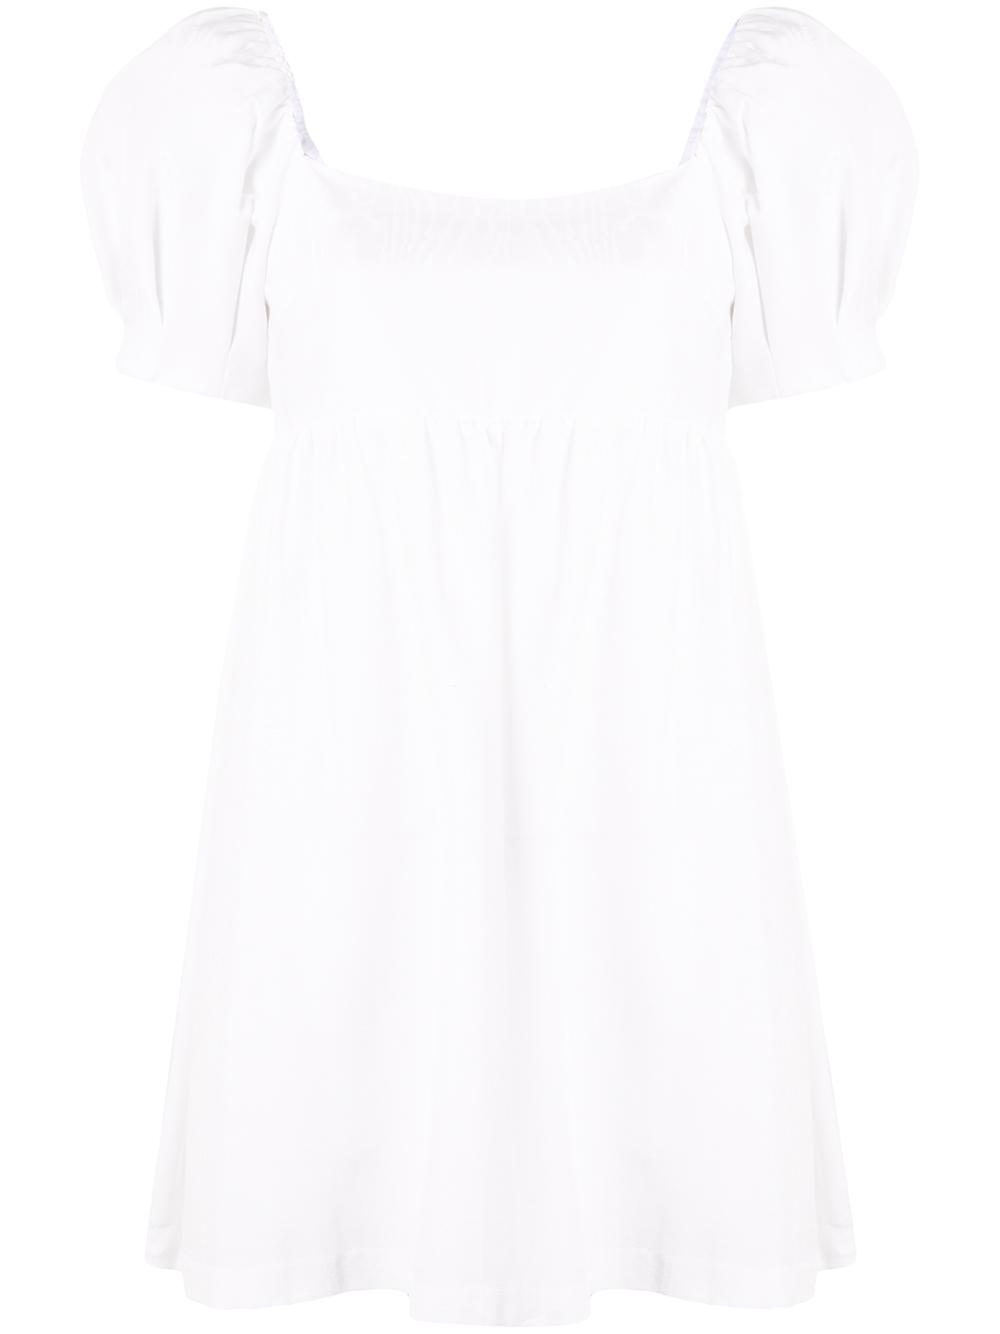 Bauery Puff Sleeve Babydoll Dress Item # CC003Q46556-C